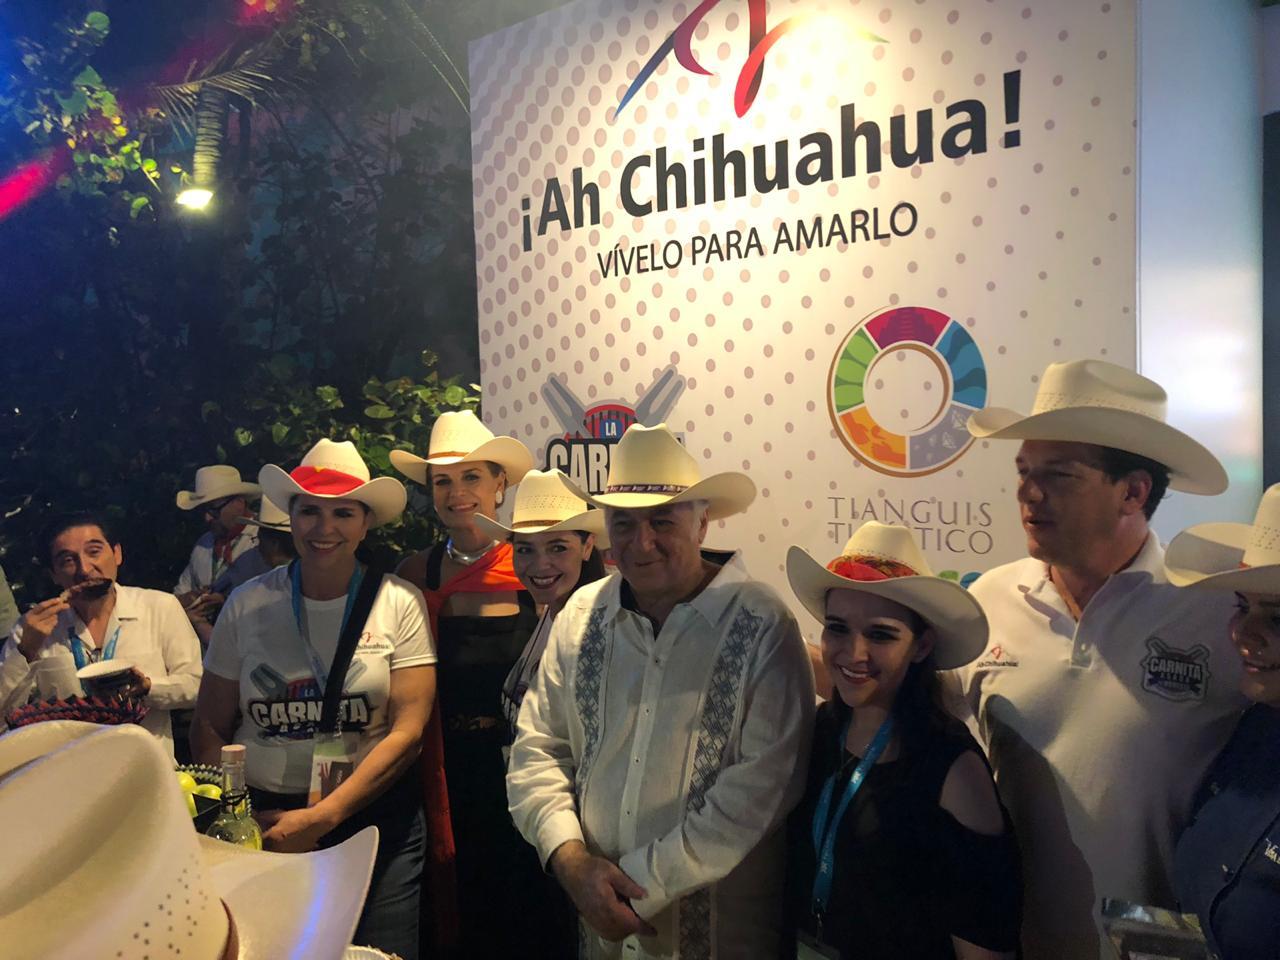 chihuahua local gay sitios de conexión